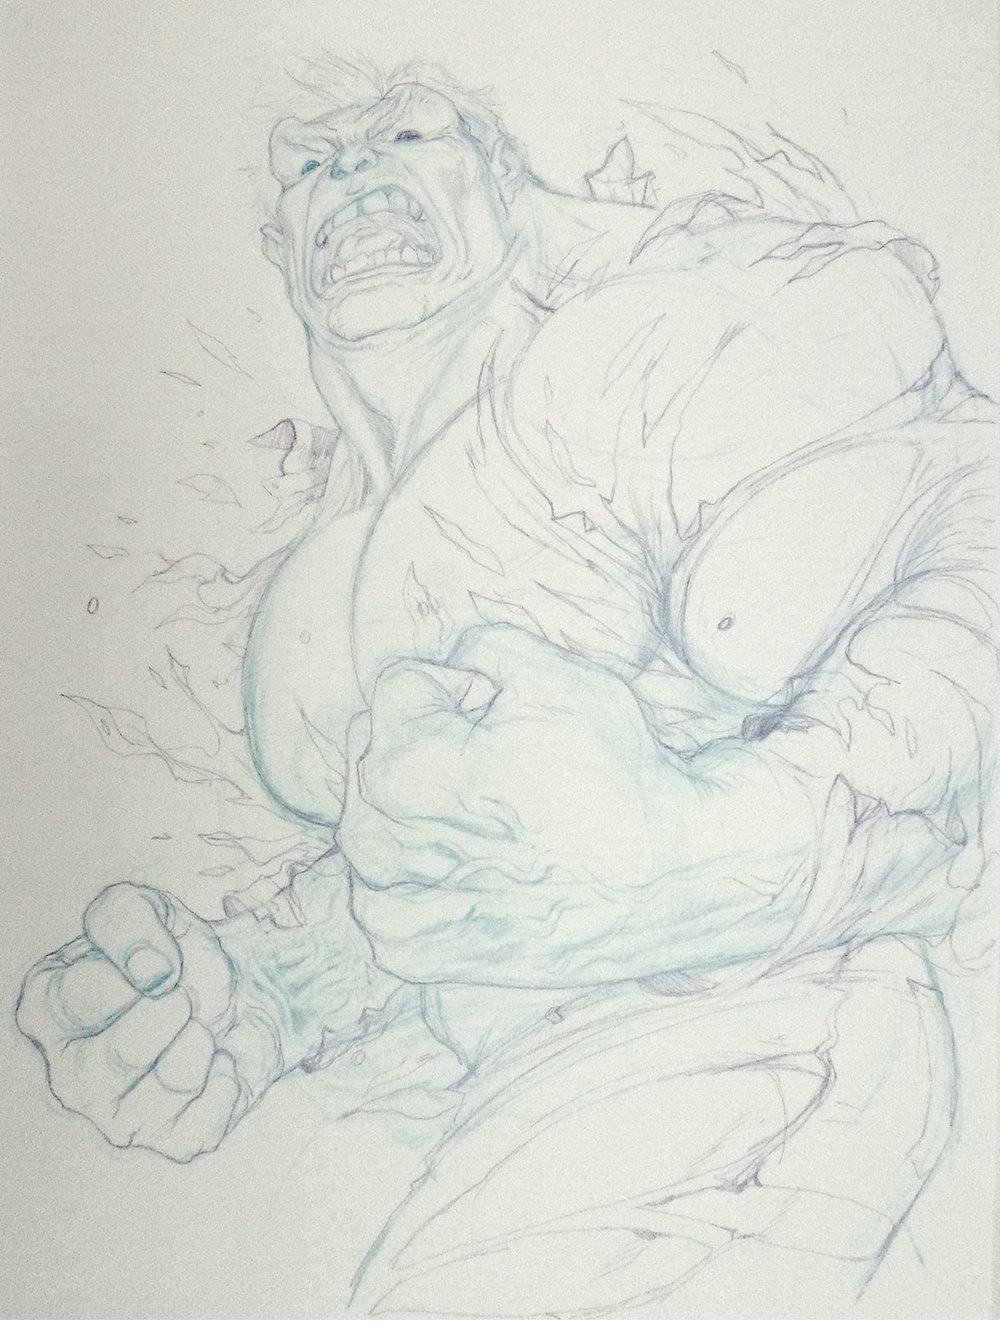 hulk-diburros-braga-08.jpg